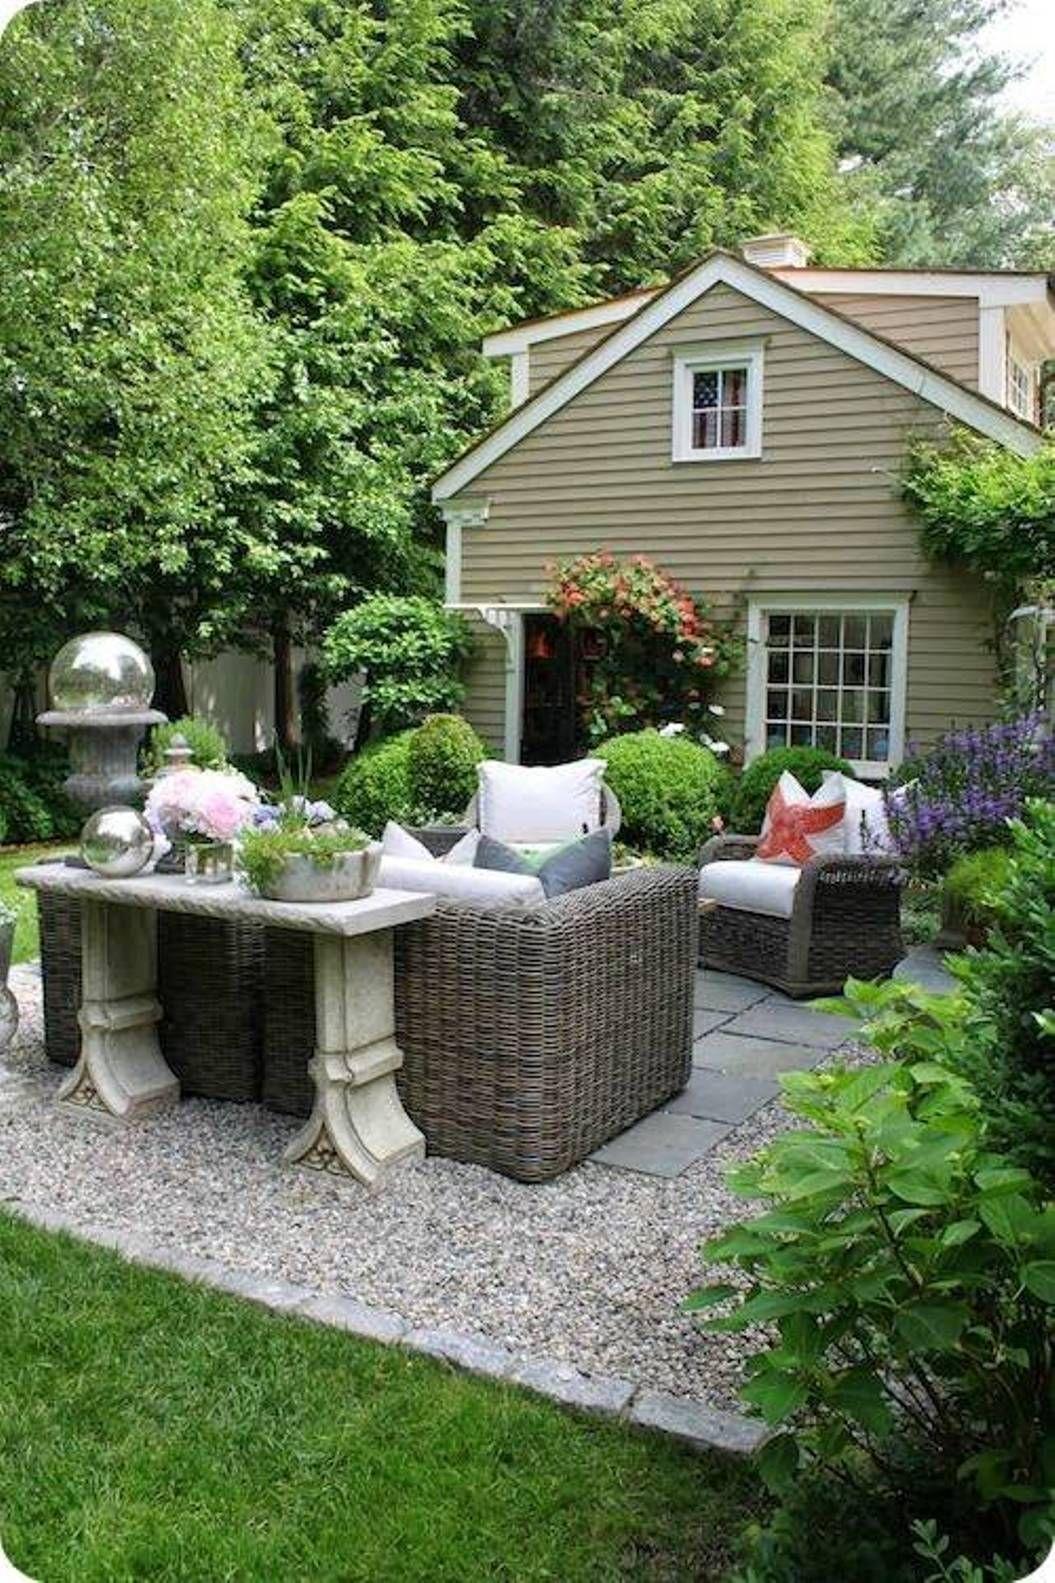 pea gravel patio with paver